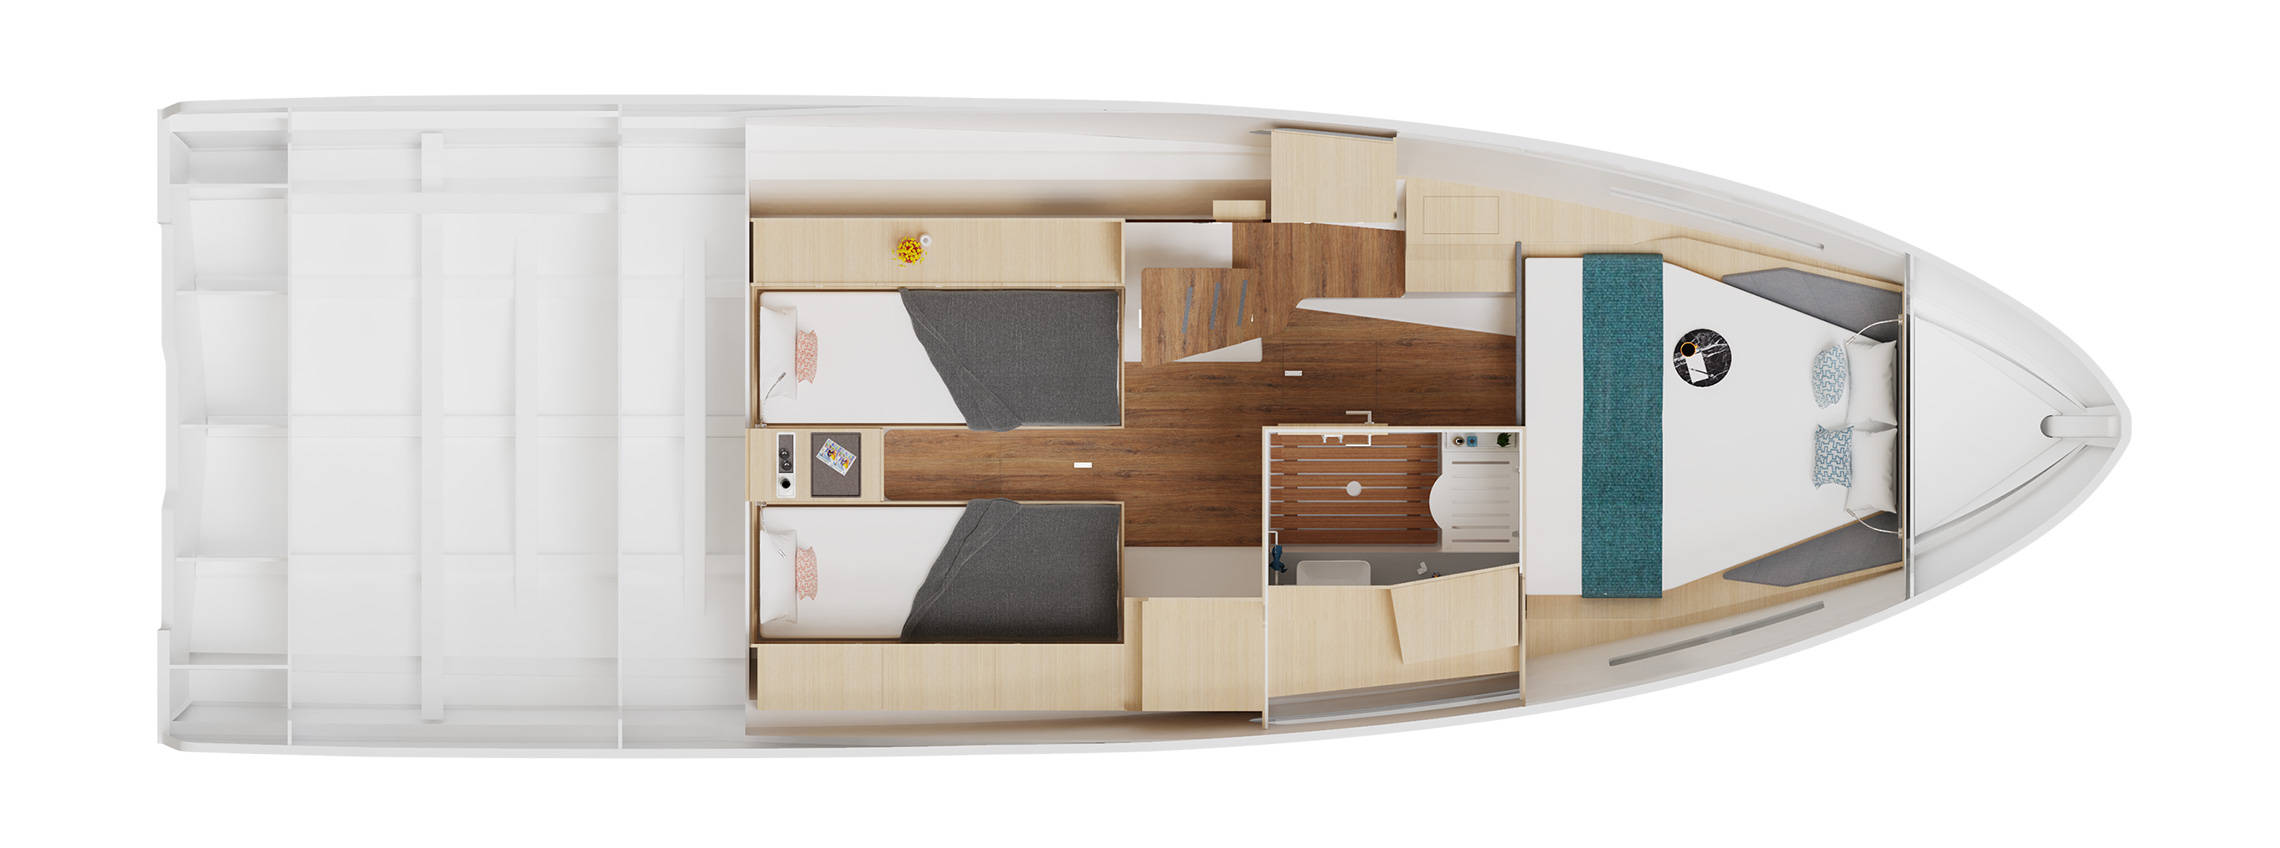 The D38 CC's Interior Floorplan